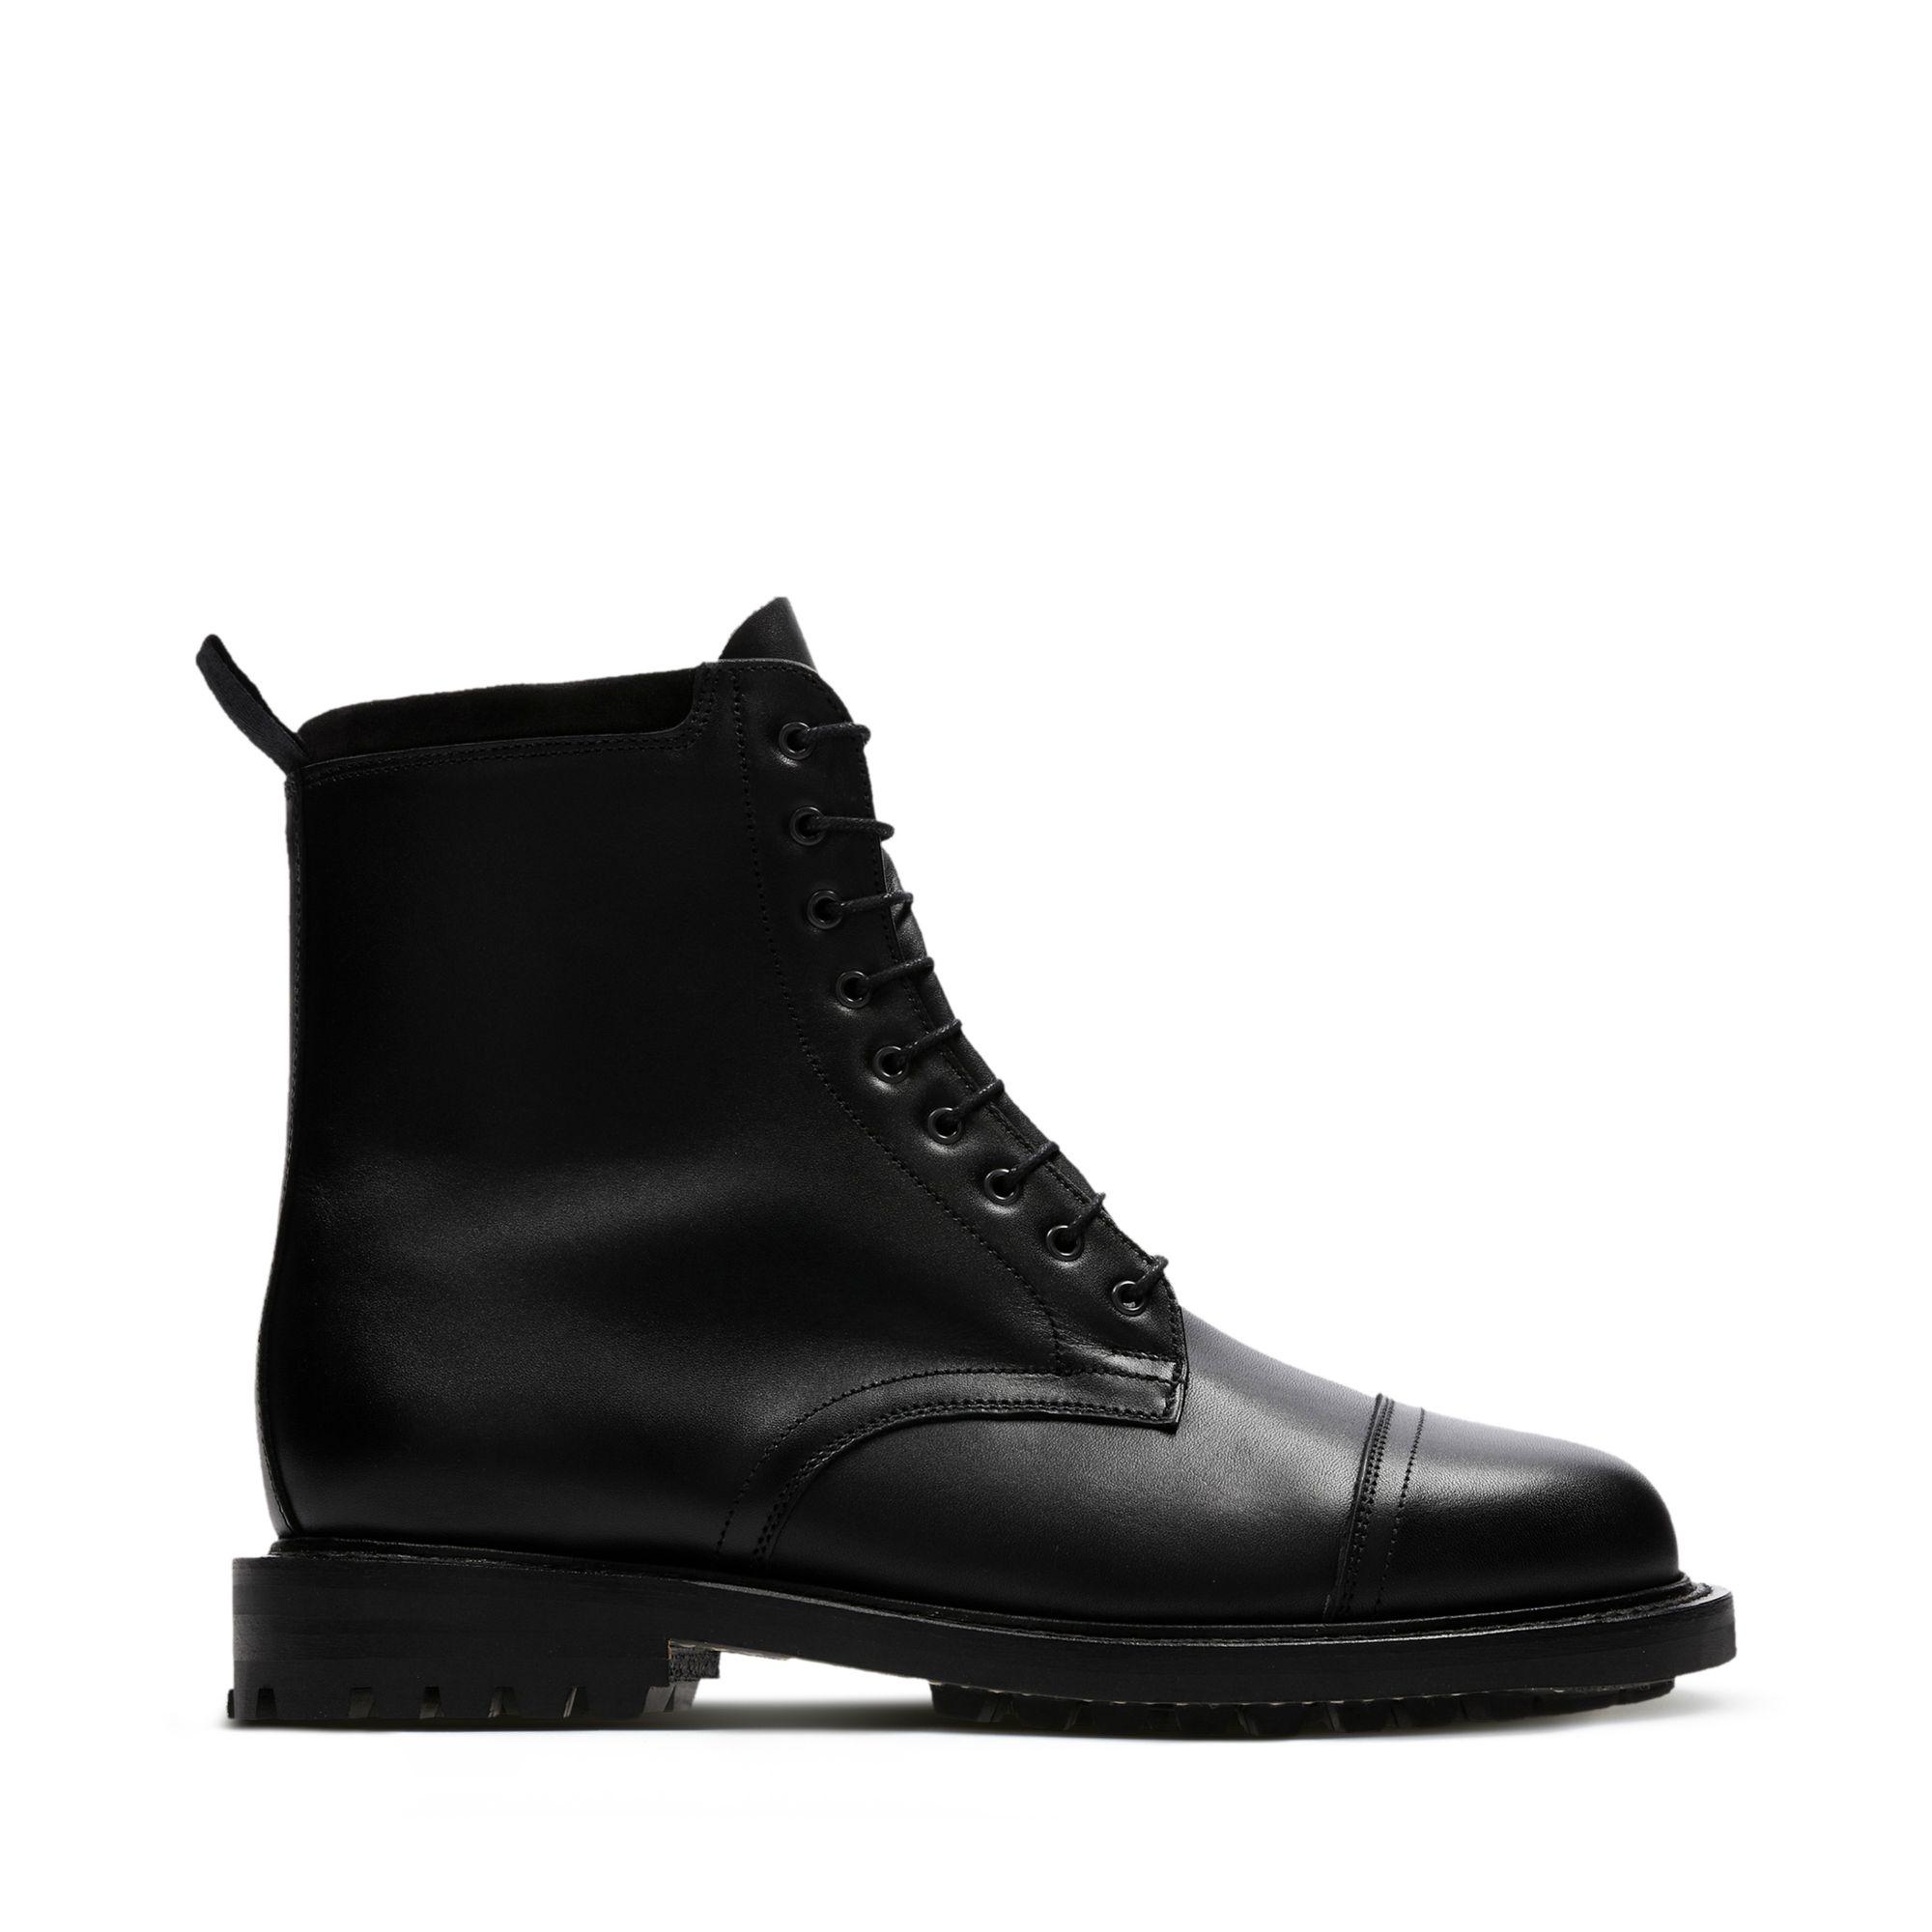 1950s Mens Shoes: Saddle Shoes, Boots, Greaser, Rockabilly Craftmaster III £175.00 AT vintagedancer.com